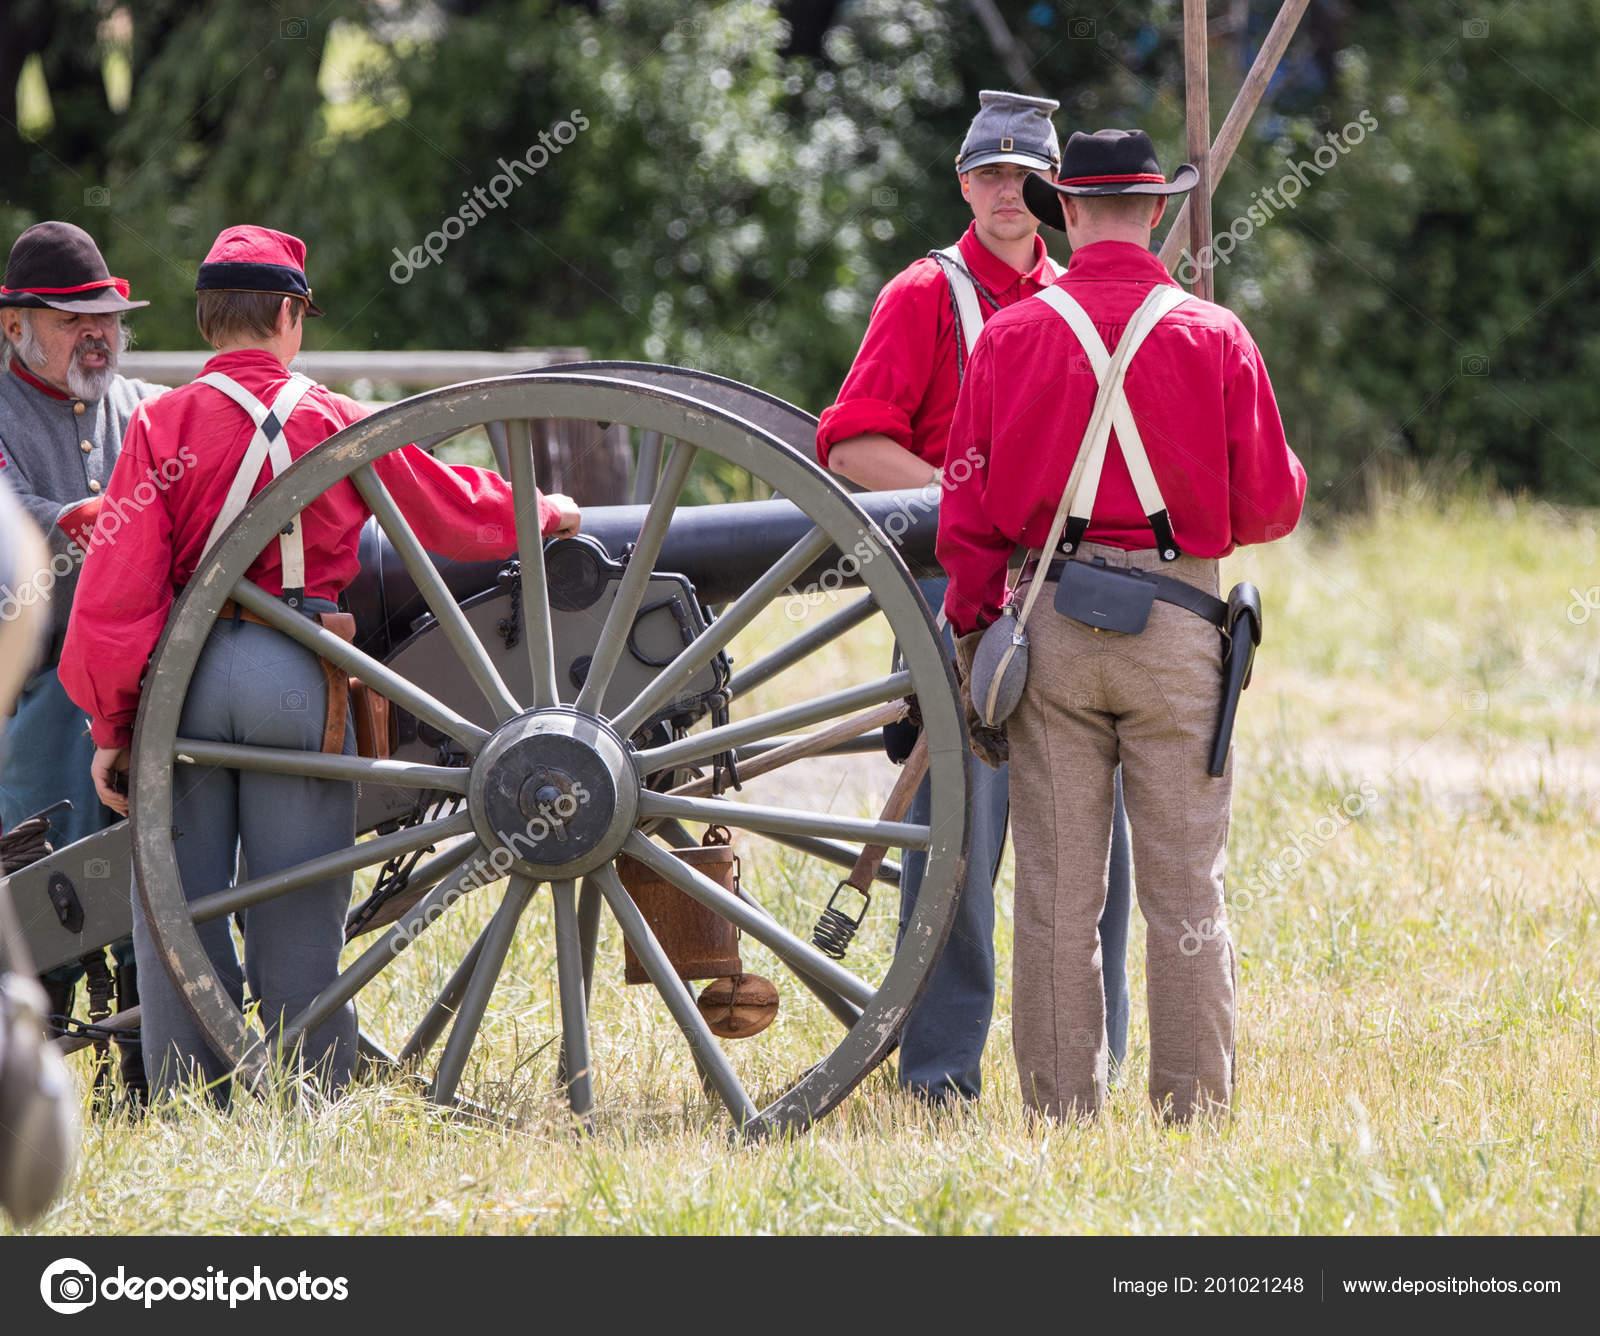 American Civil War Reenactment Fullbright Park Union Gap